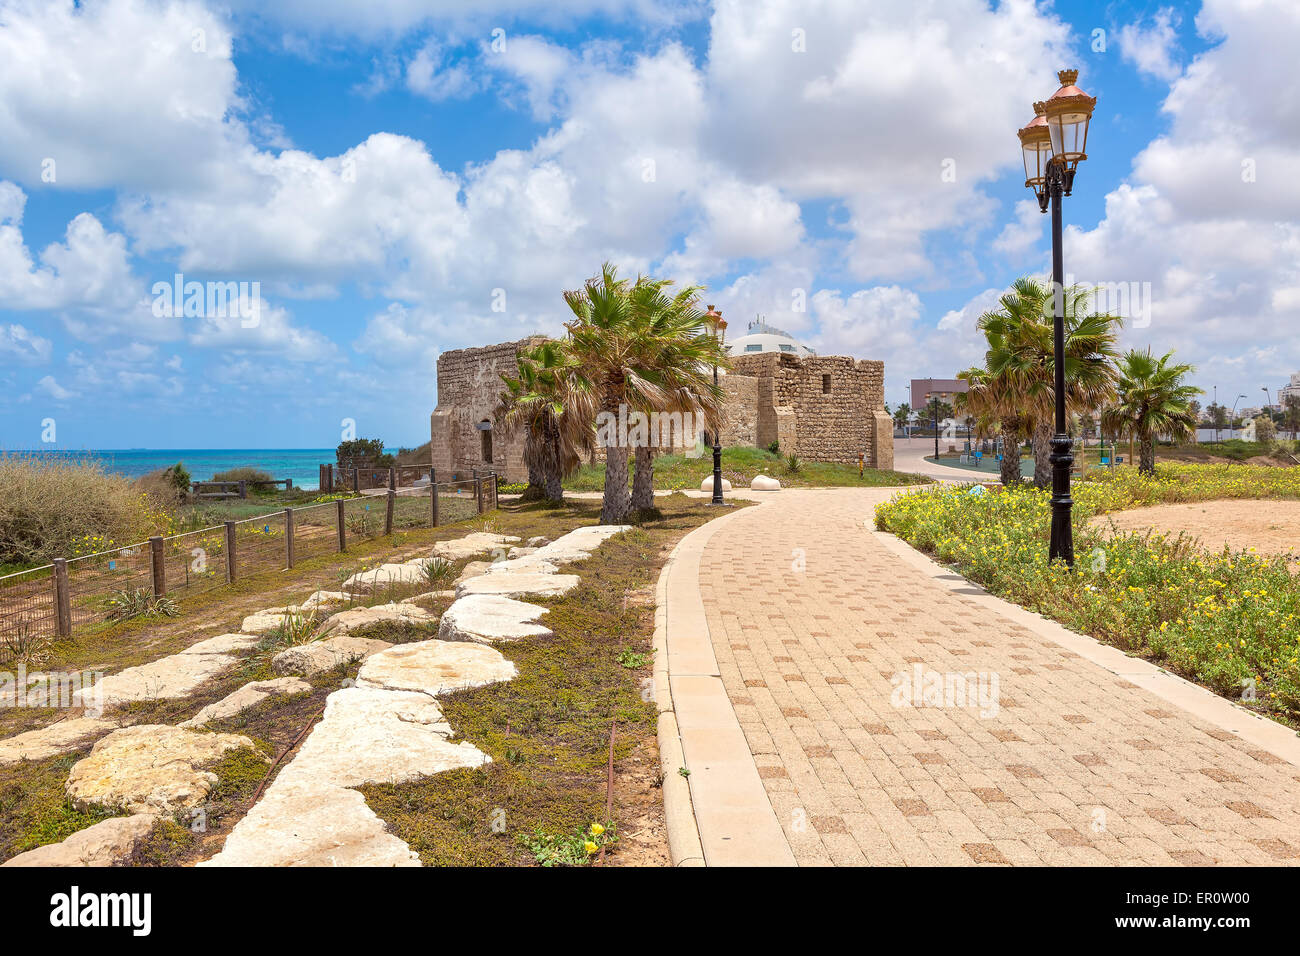 Pedestrian walkway, lampposts and ancient on promenade along Mediterranean sea coastline in Ashqelon, Israel. - Stock Image